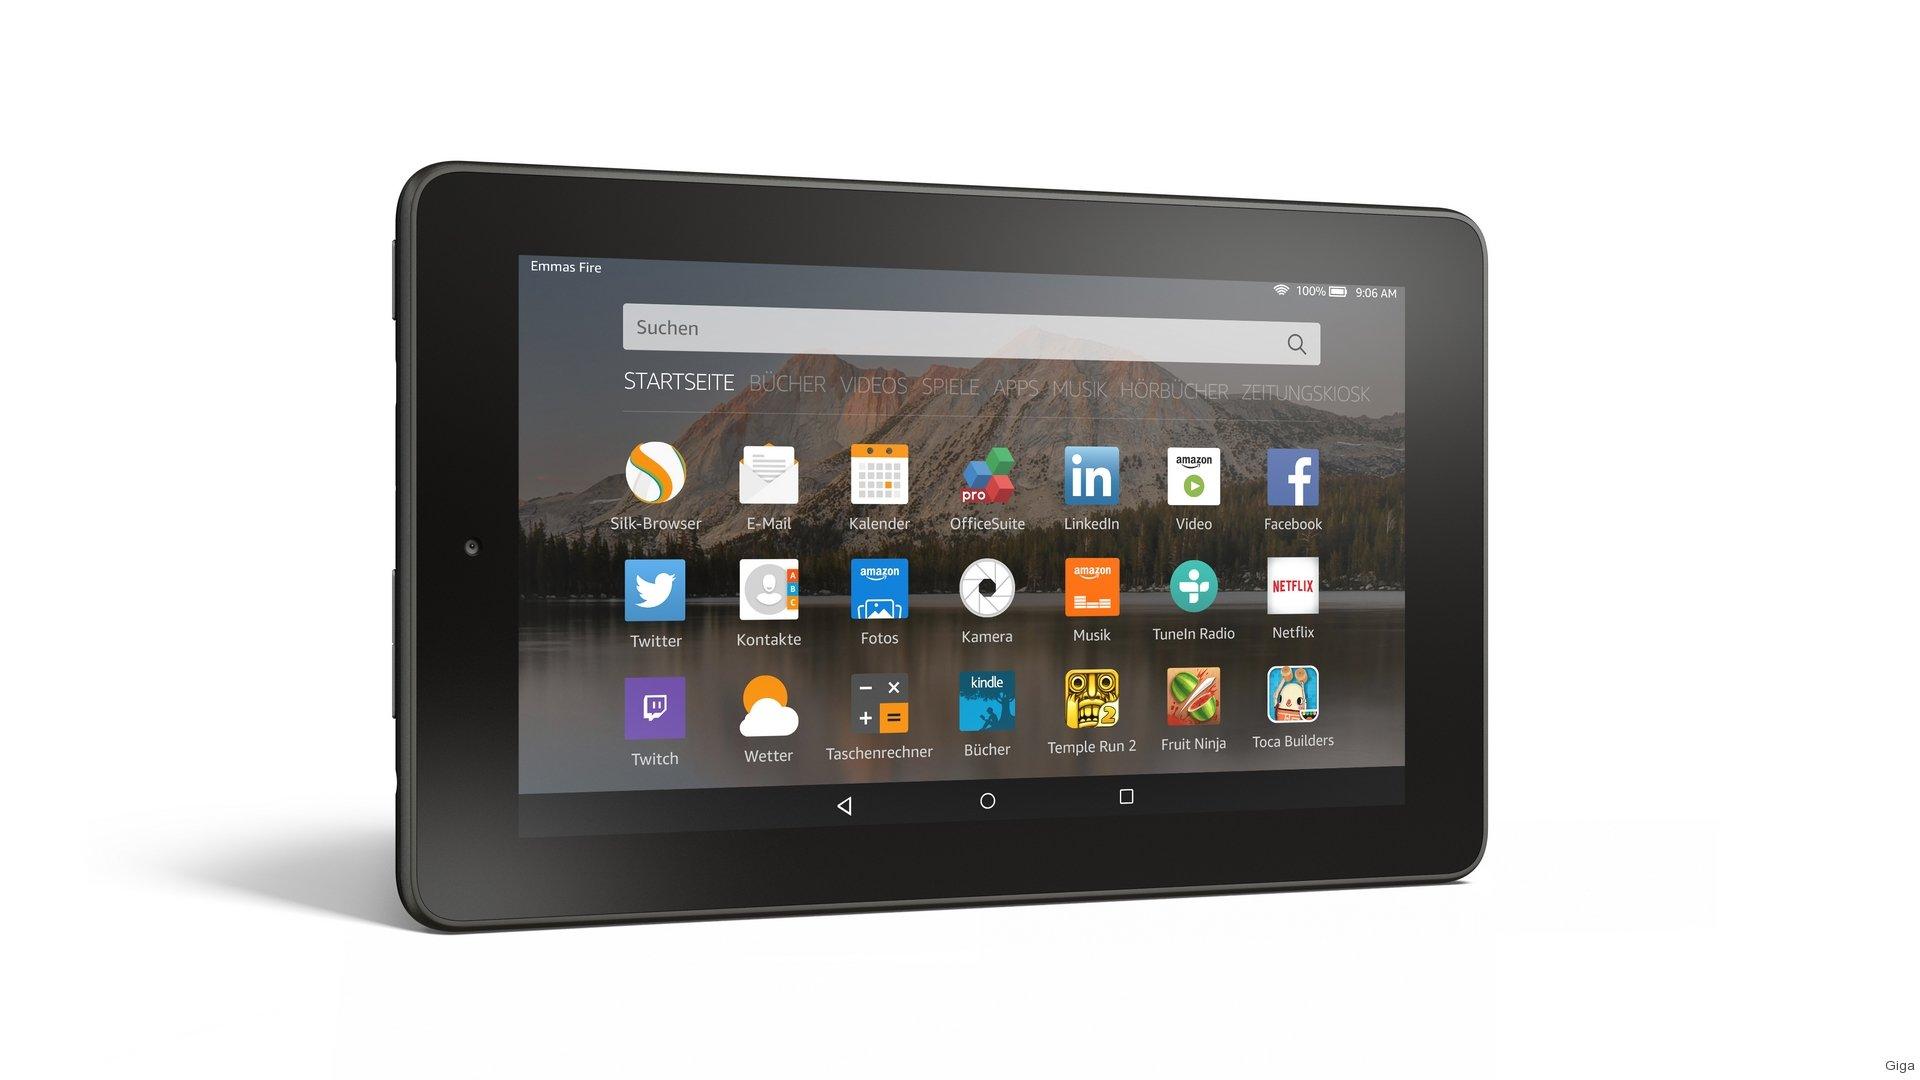 amazon fire im hands on quad core tablet f r 60 euro vorgestellt giga. Black Bedroom Furniture Sets. Home Design Ideas